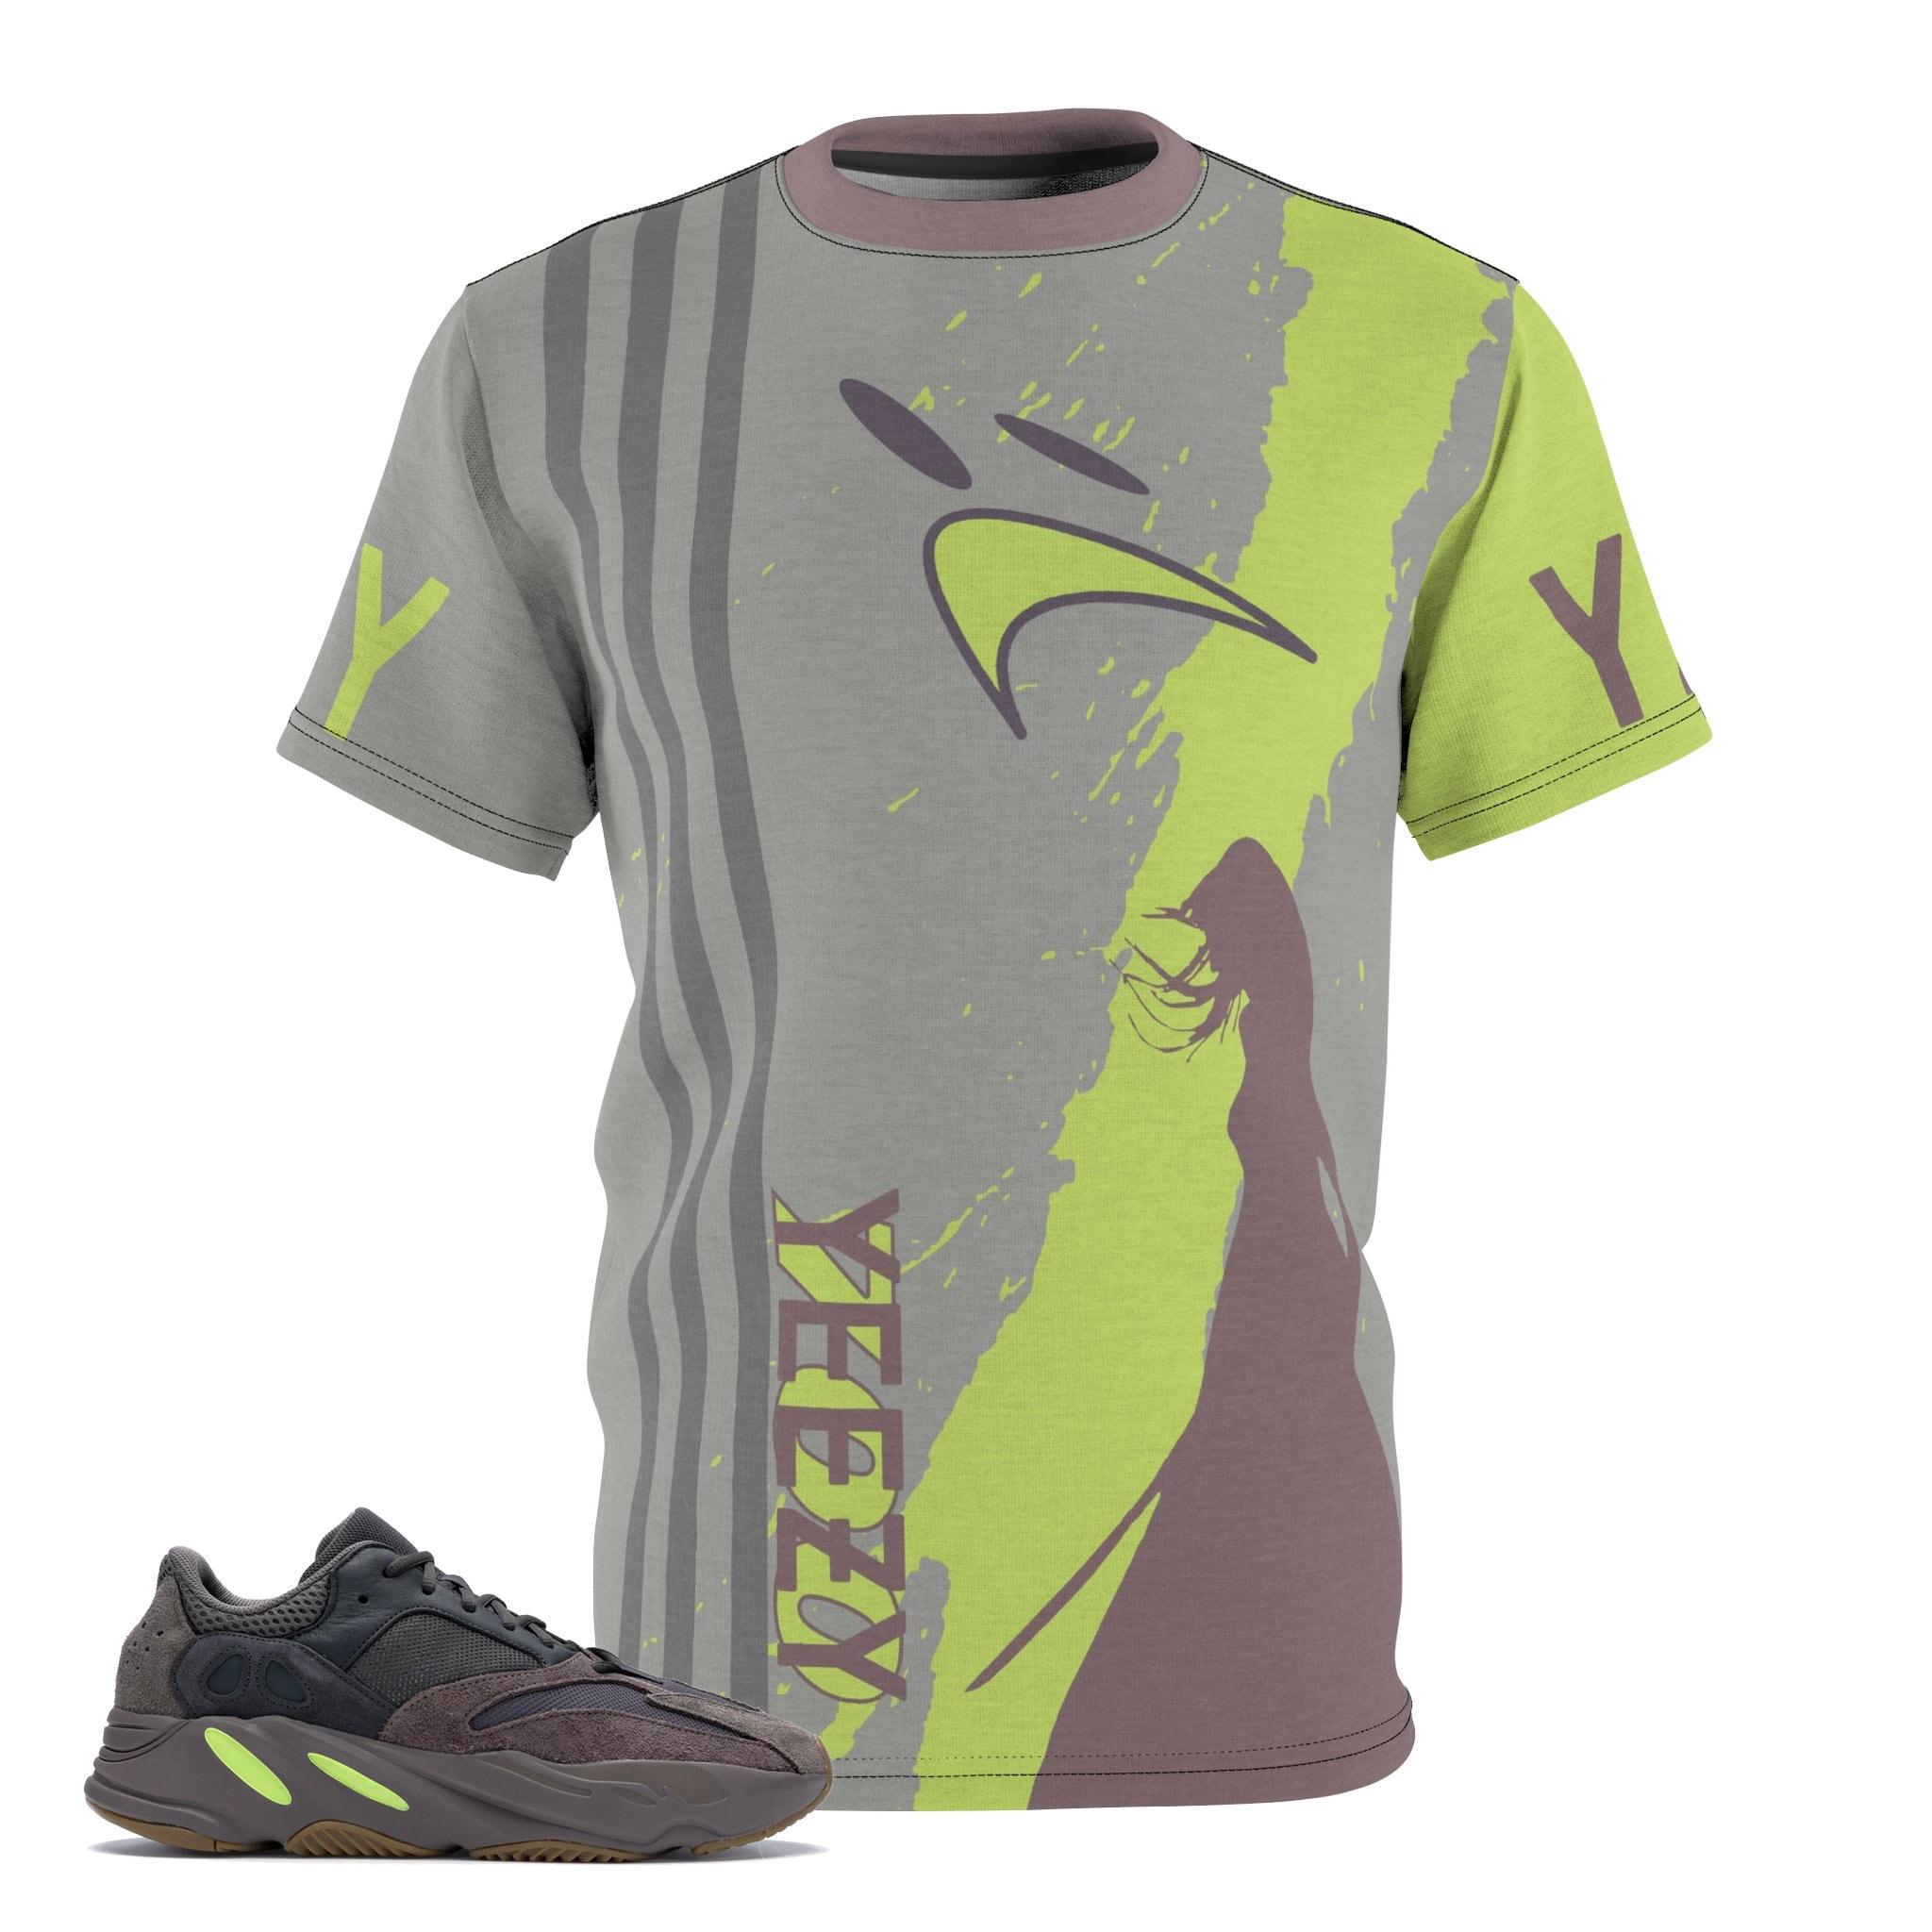 adidas yeezy 700 shirt